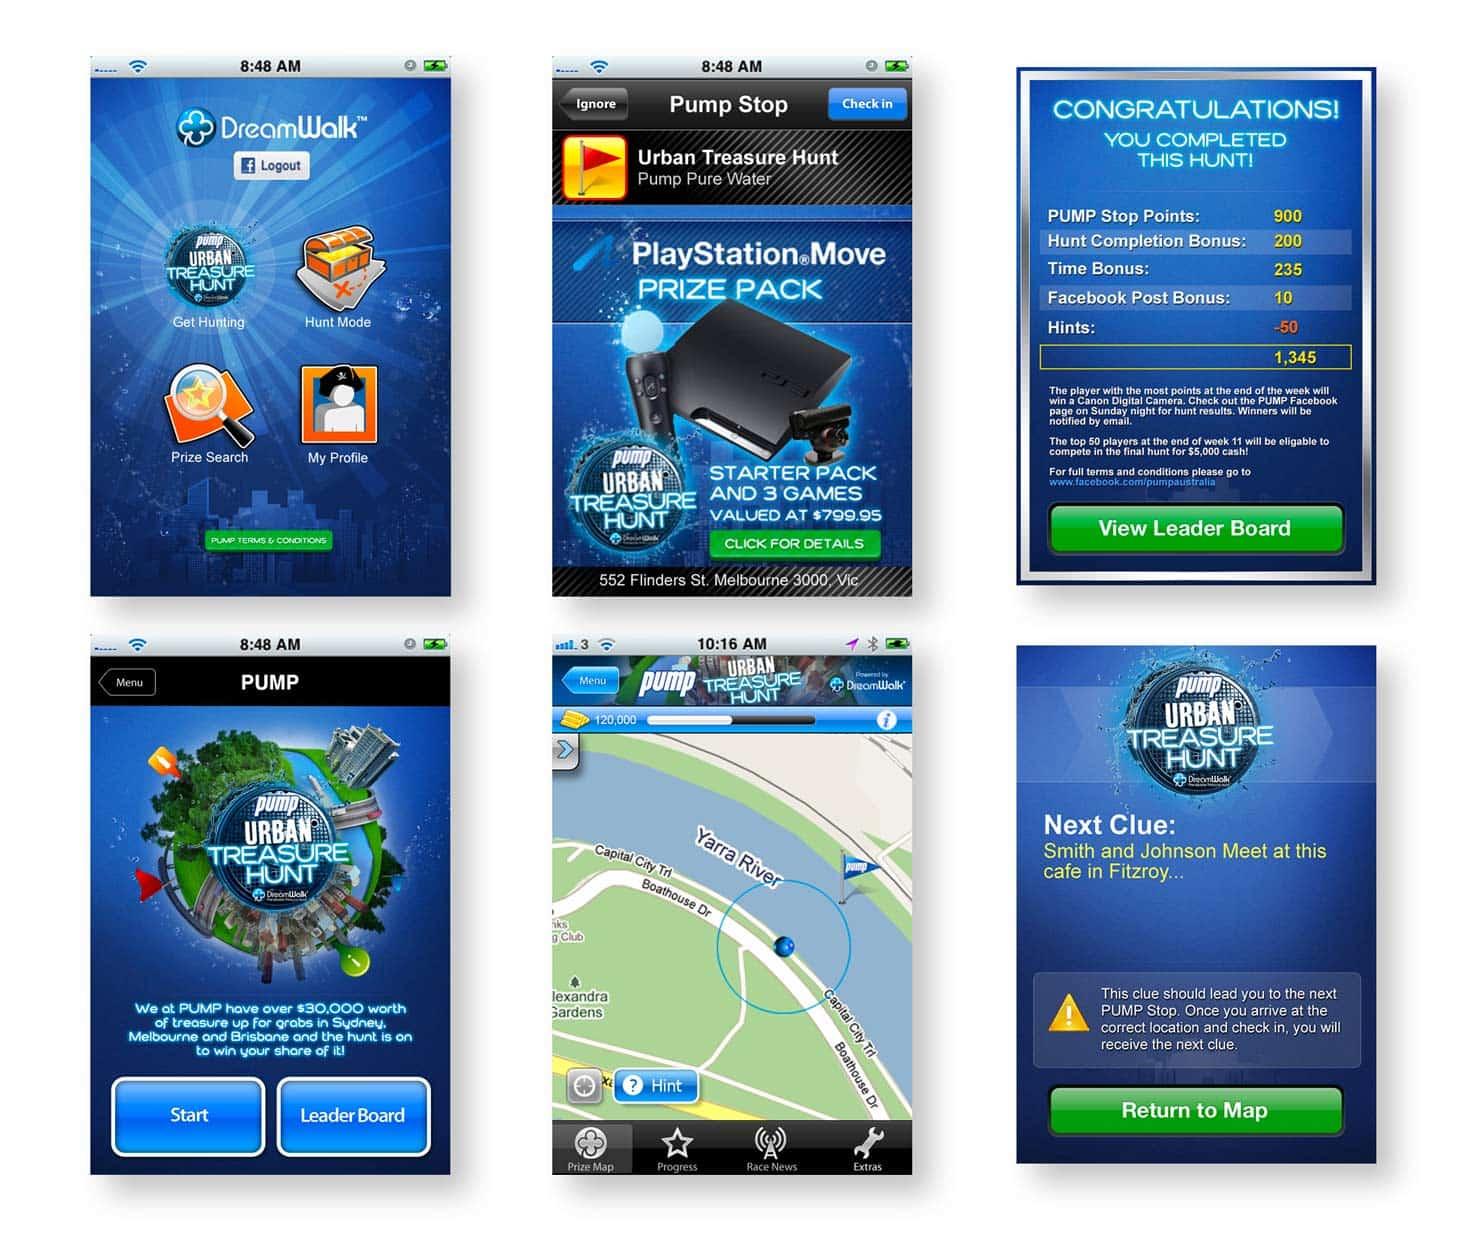 Pump Urban Treasure Hunt UI designer